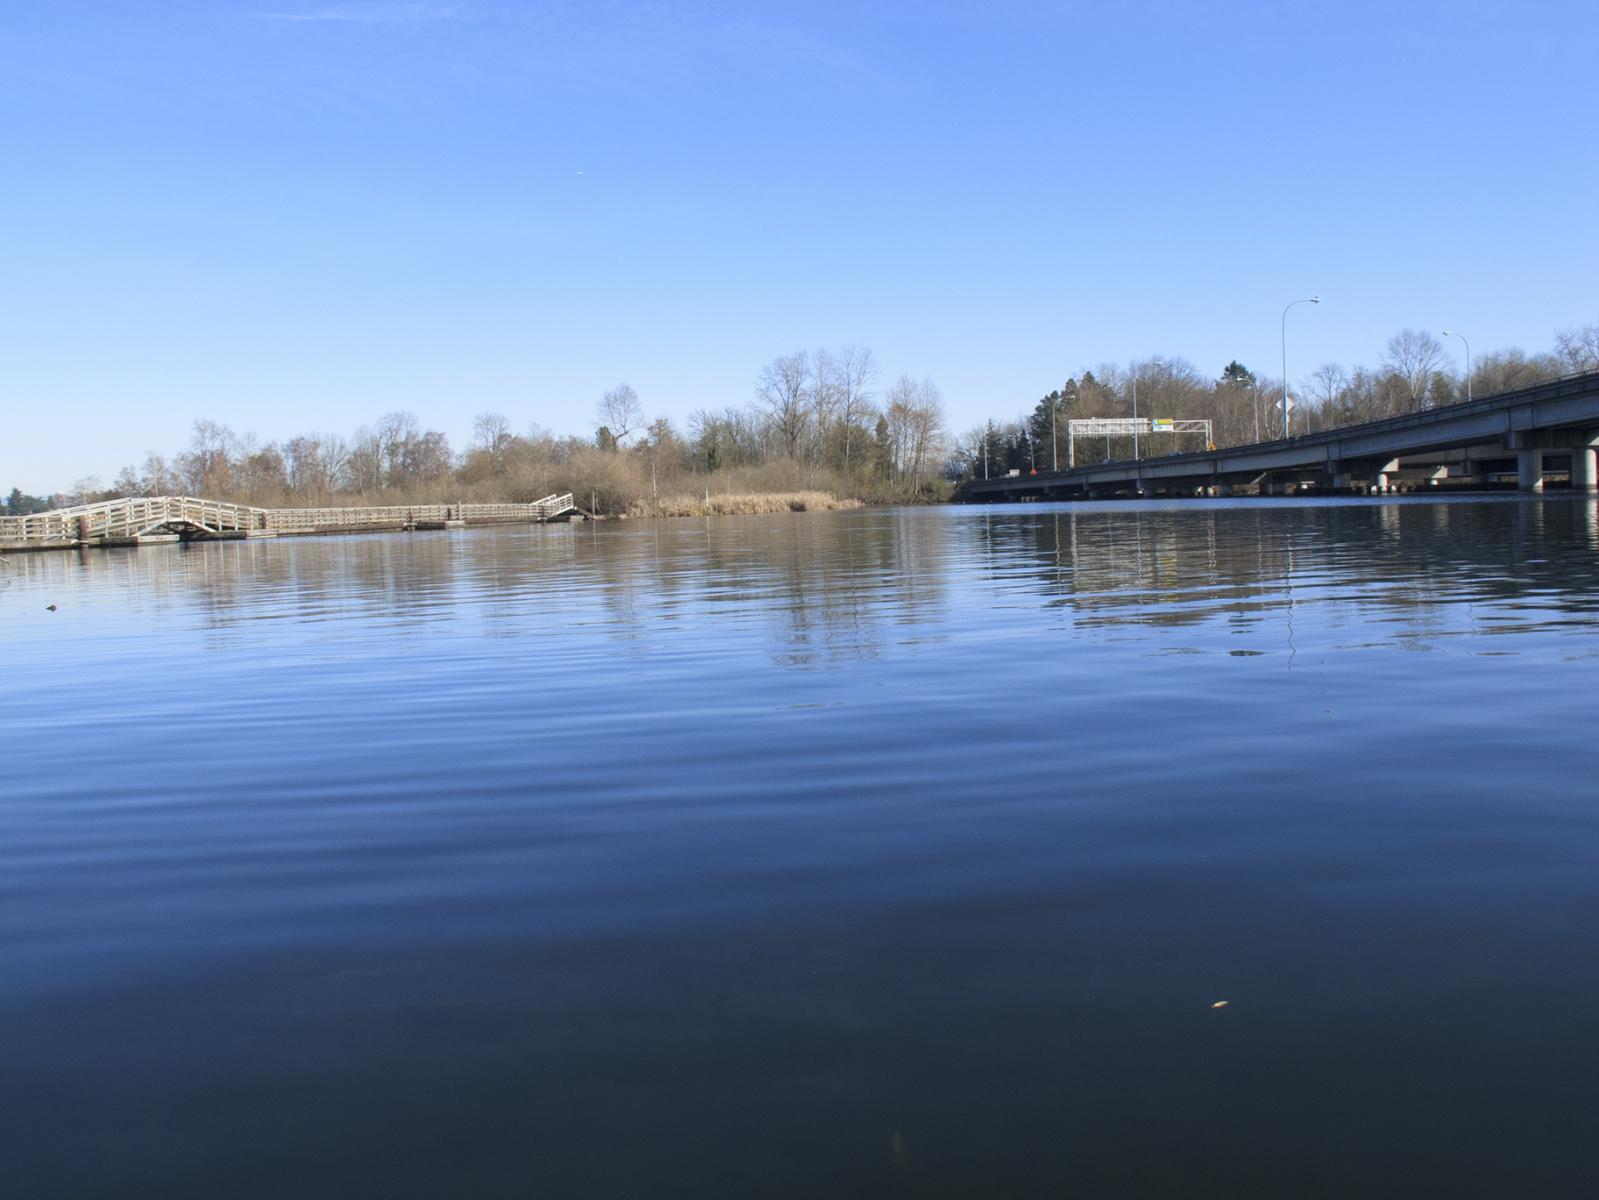 Longest Floating Bridge in the World